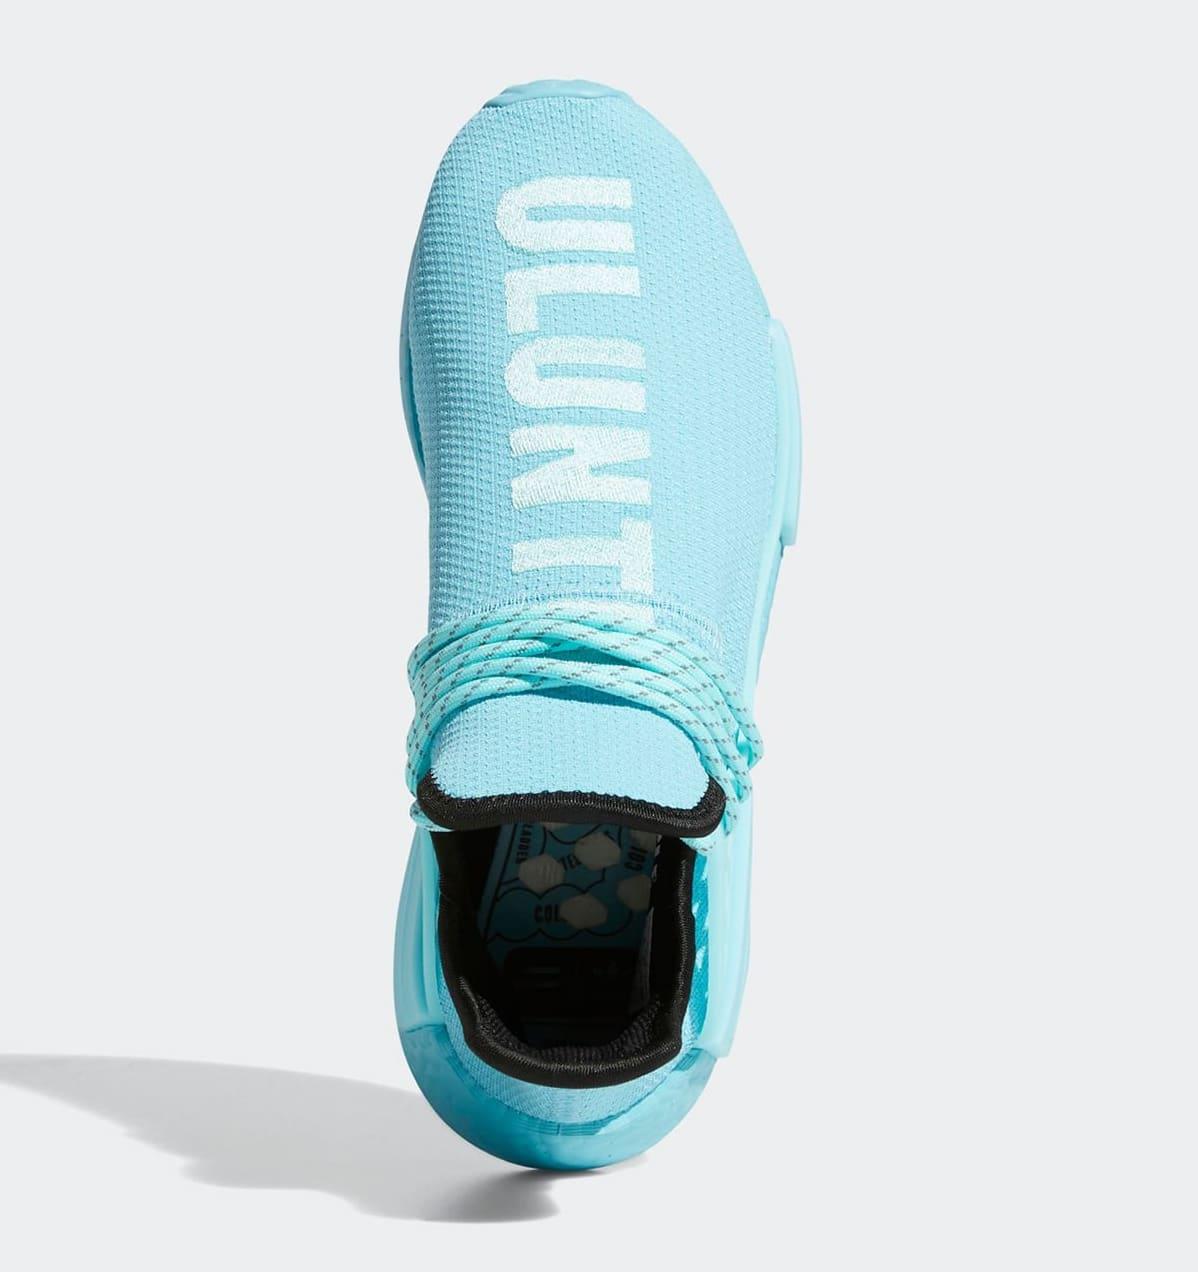 Pharrell Adidas NMD Hu 'Aqua' GY0094 Top